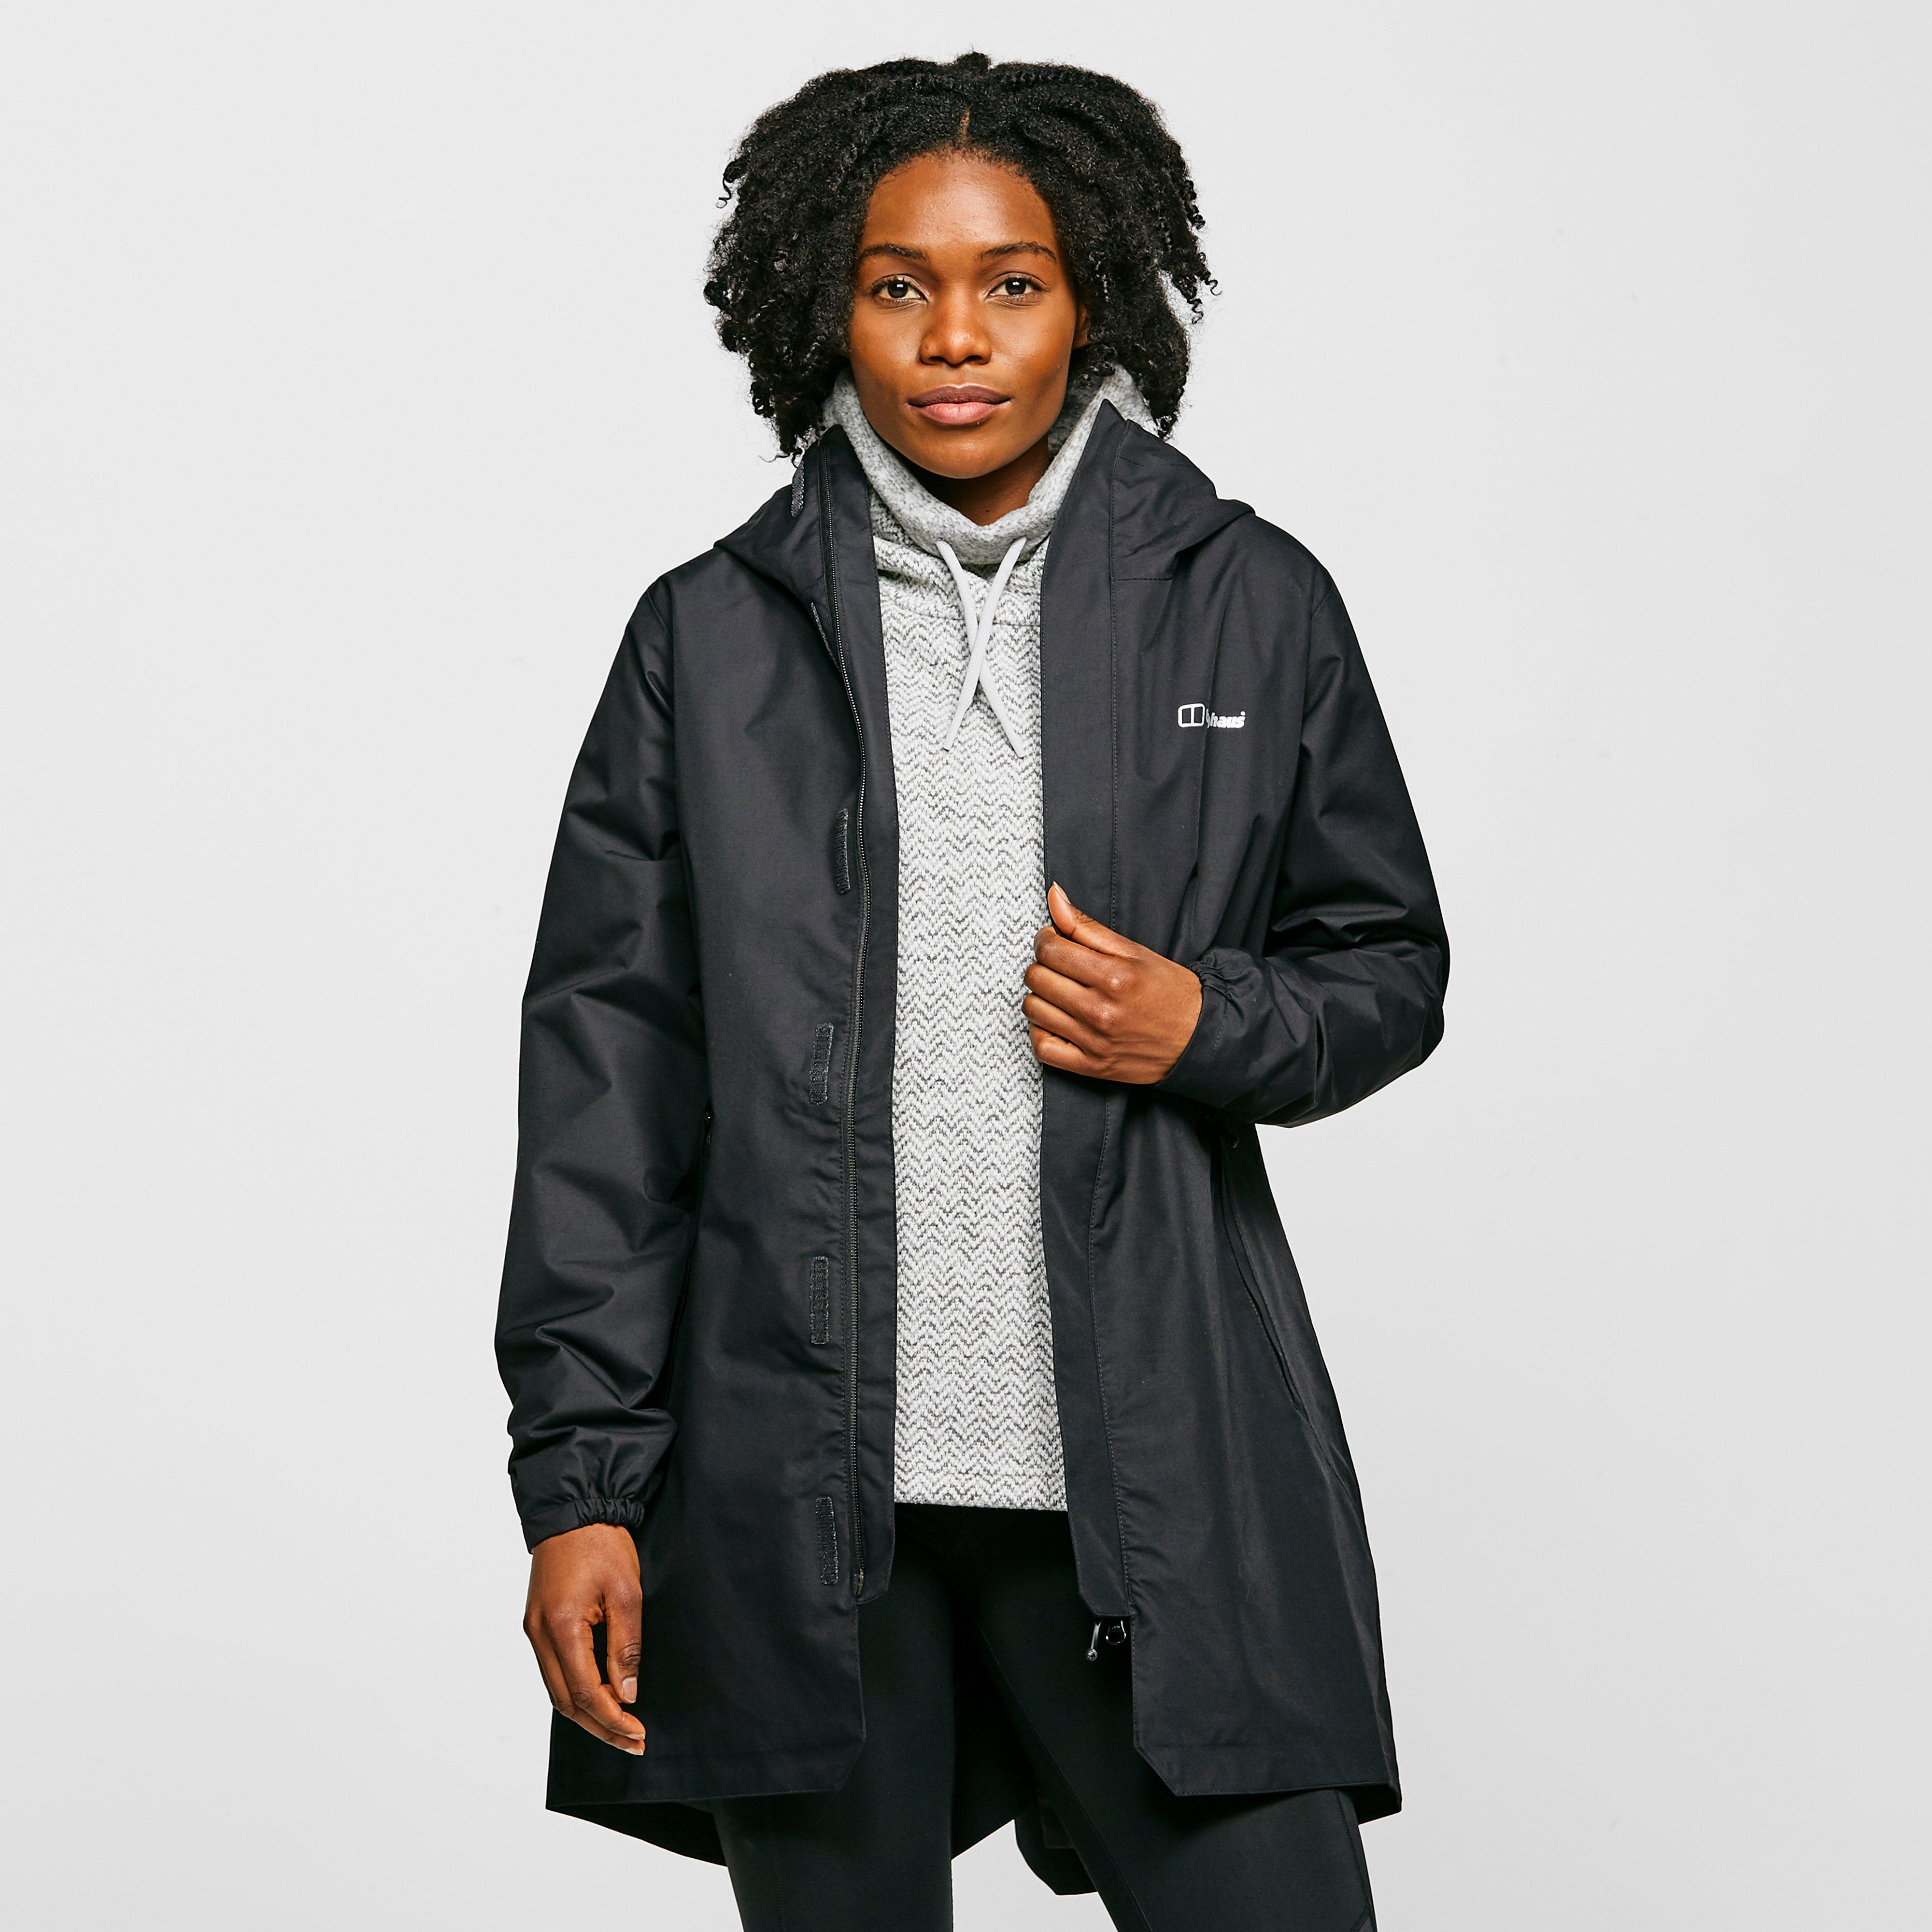 Berghaus Womens Commuter Waterproof Jacket - Black/blk  Black/blk